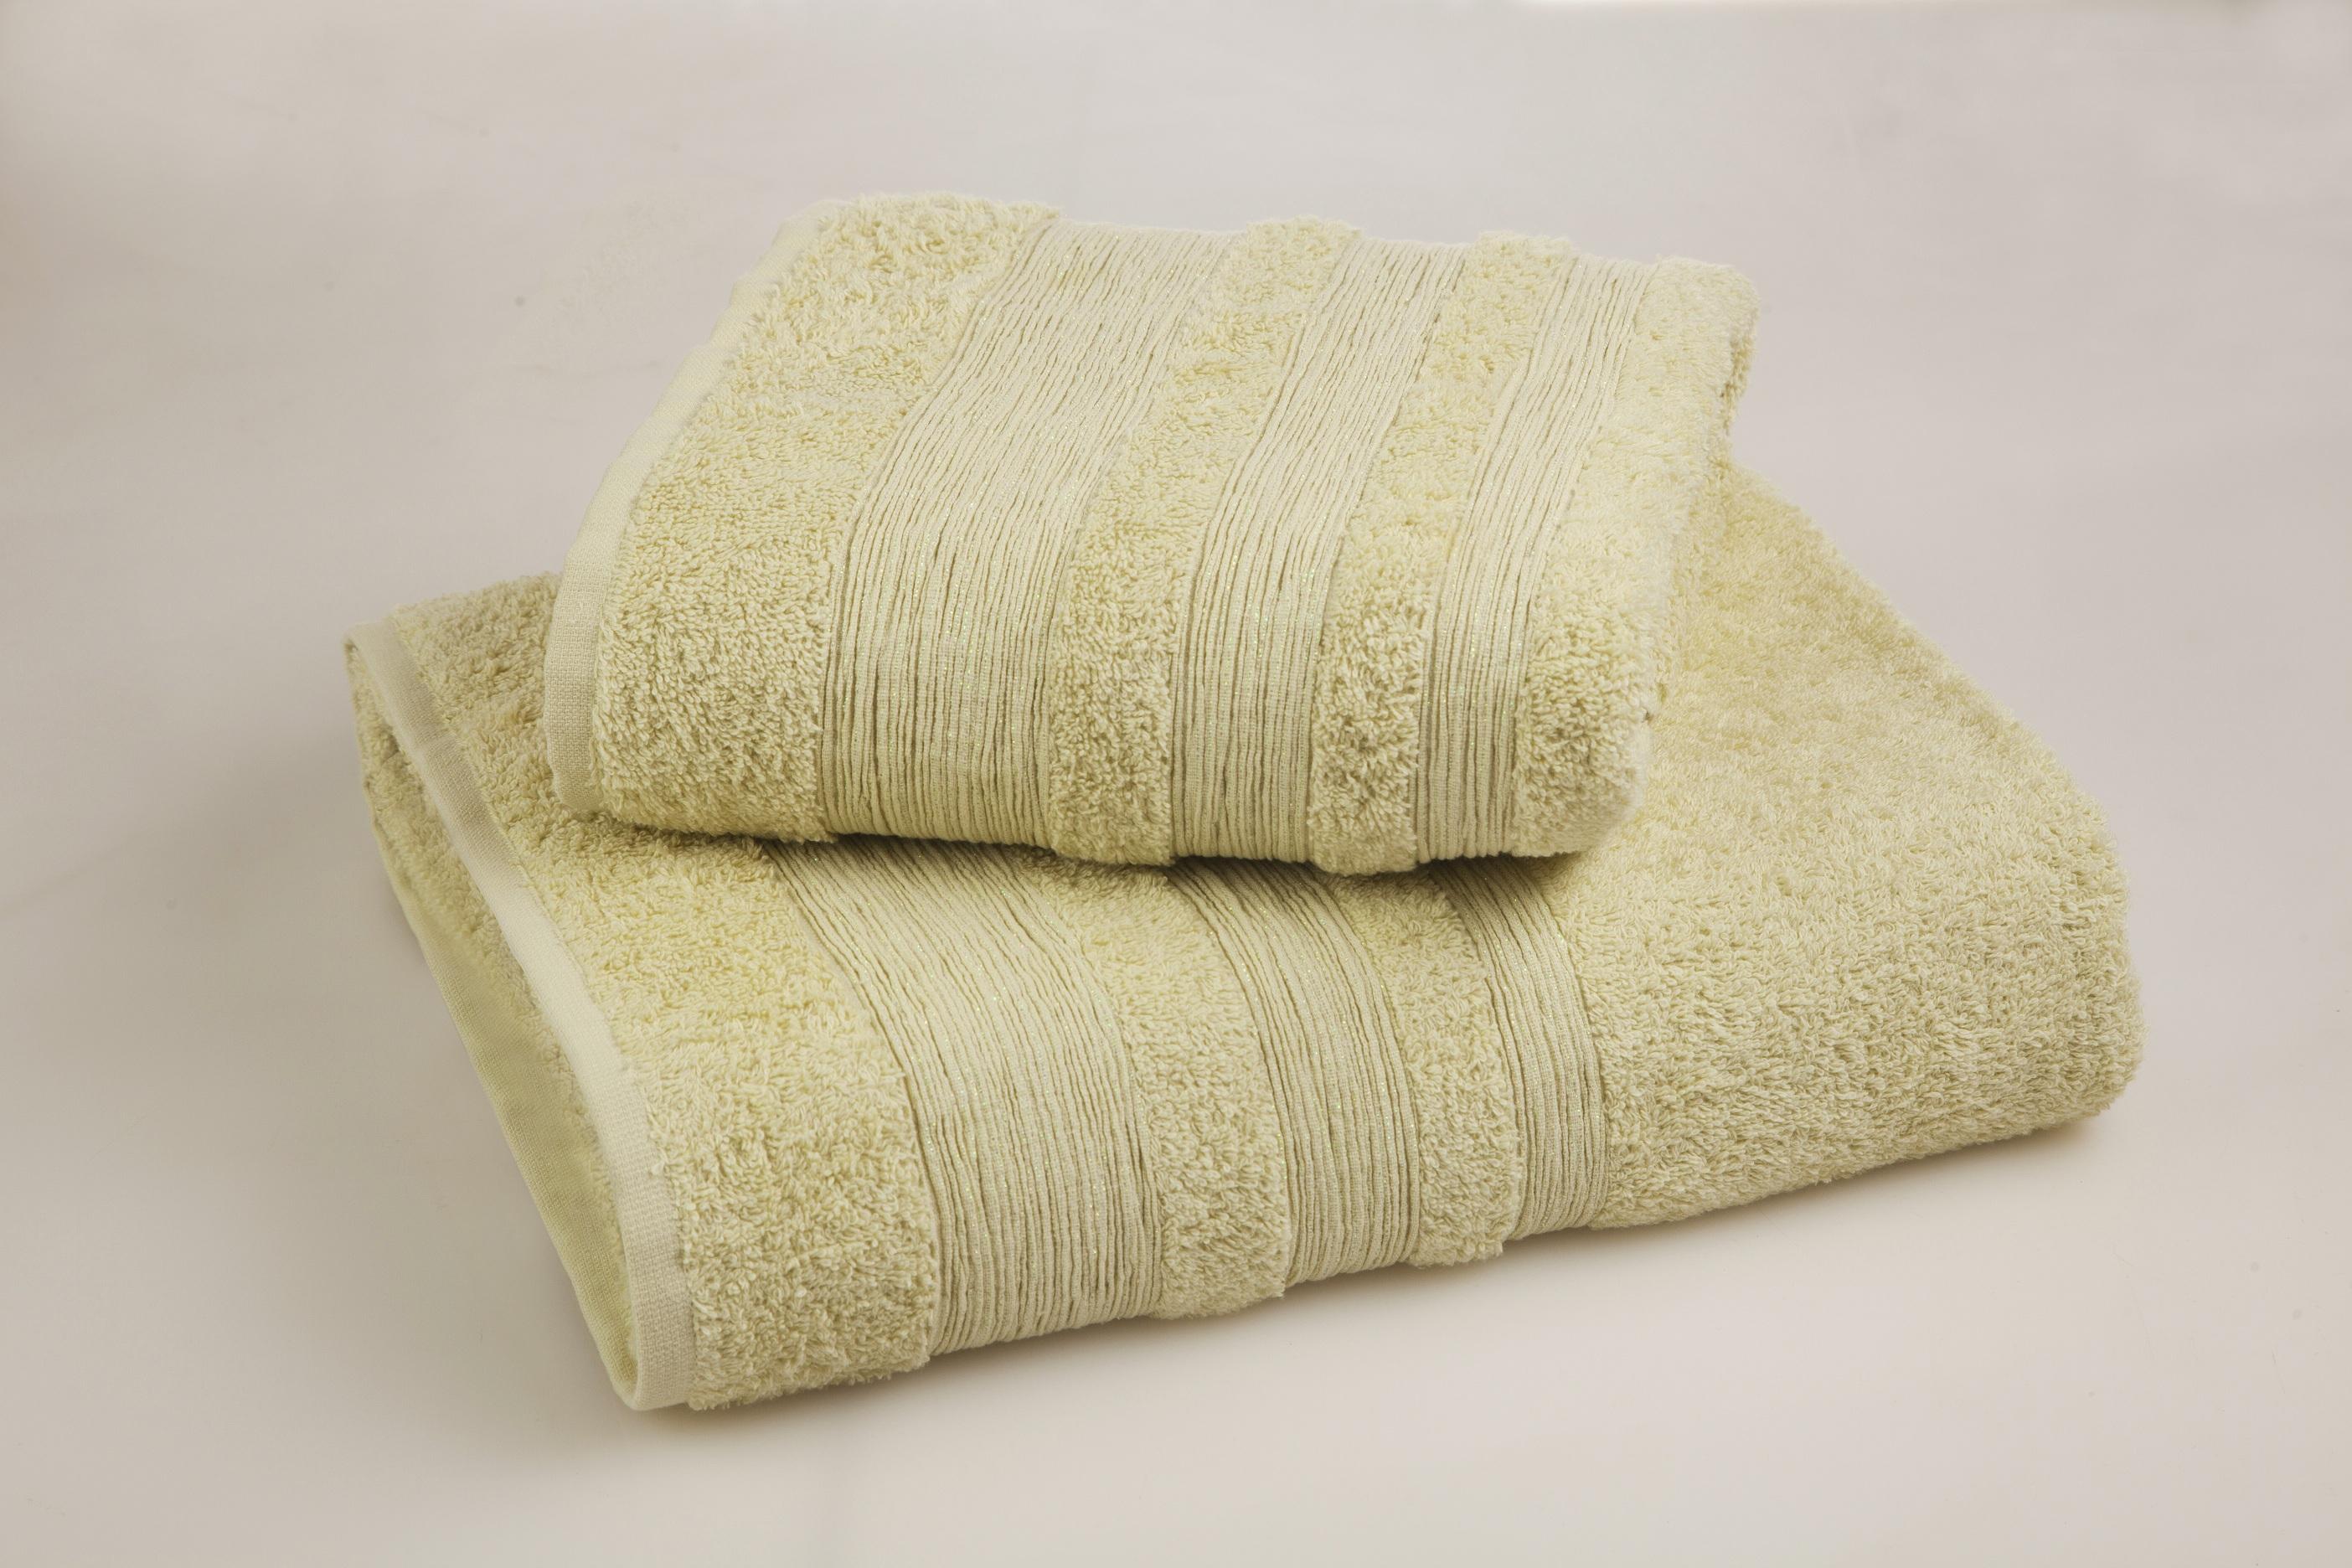 Полотенца Унисон Полотенце Caprice Цвет: Салатовый (Набор) полотенце набор хлопок 1017235